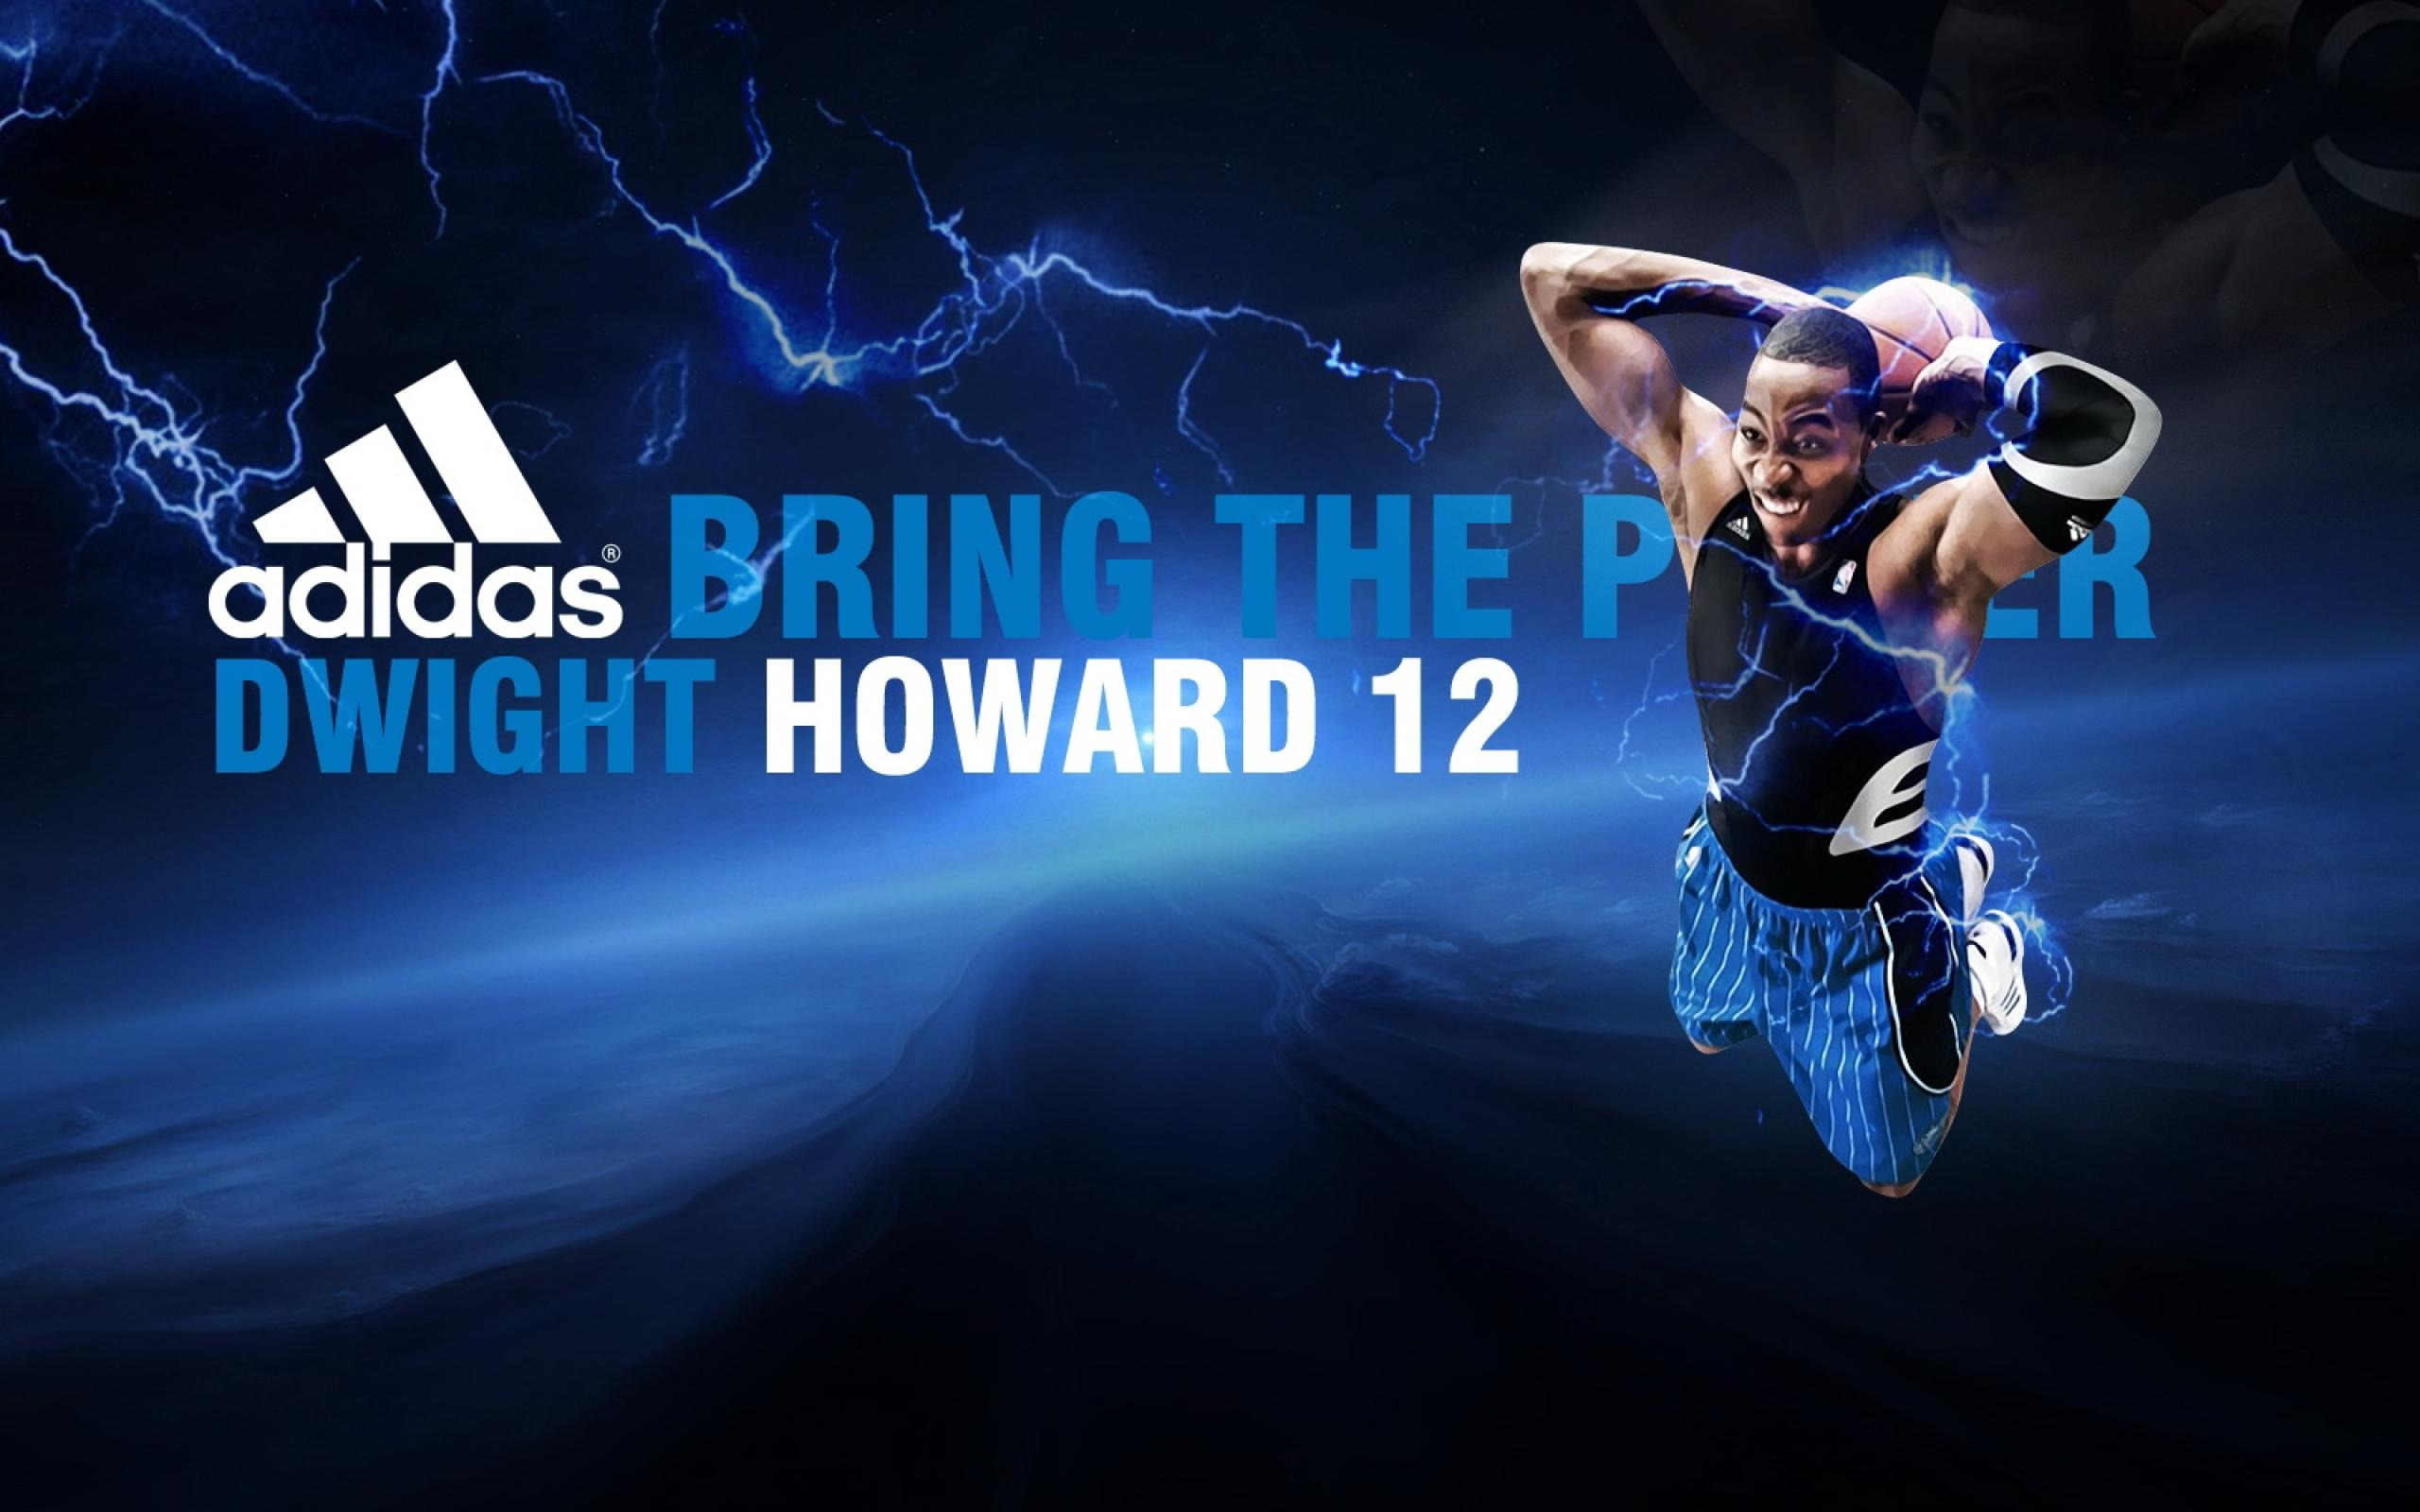 adidas brand dwight howardphotographie sports wallpaper